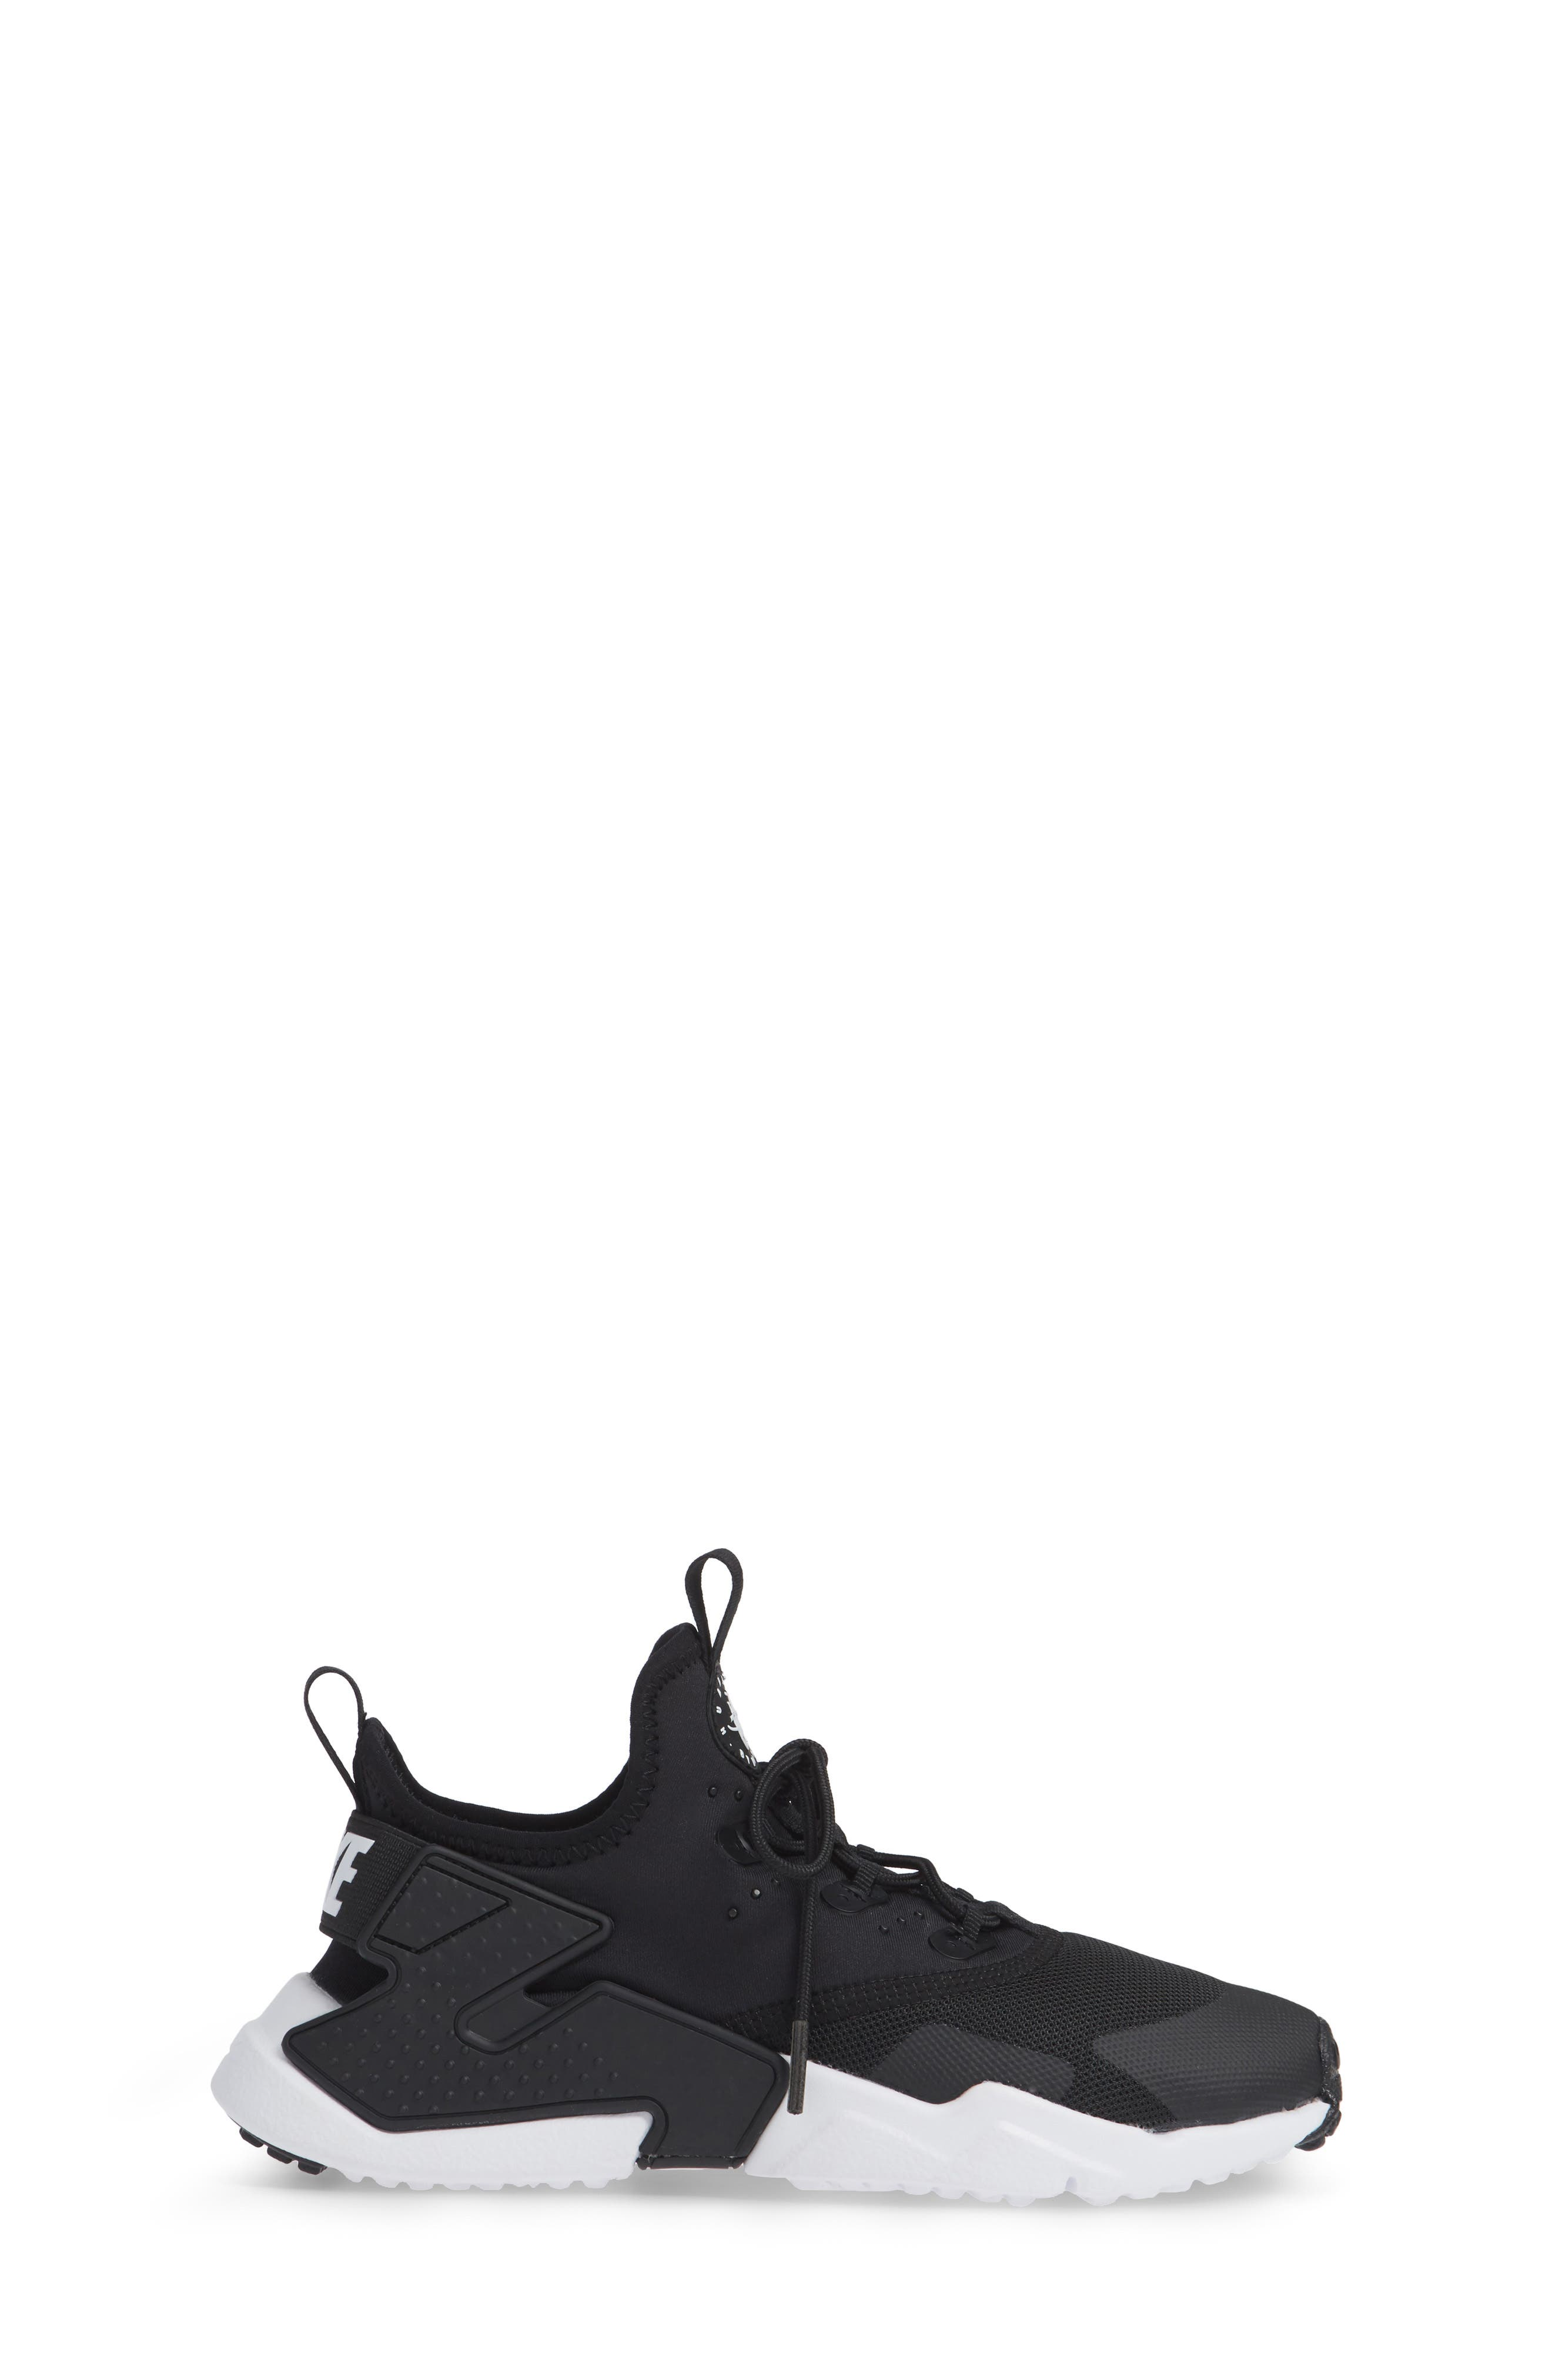 Huarache Run Drift Sneaker,                             Alternate thumbnail 5, color,                             Black/ Anthracite